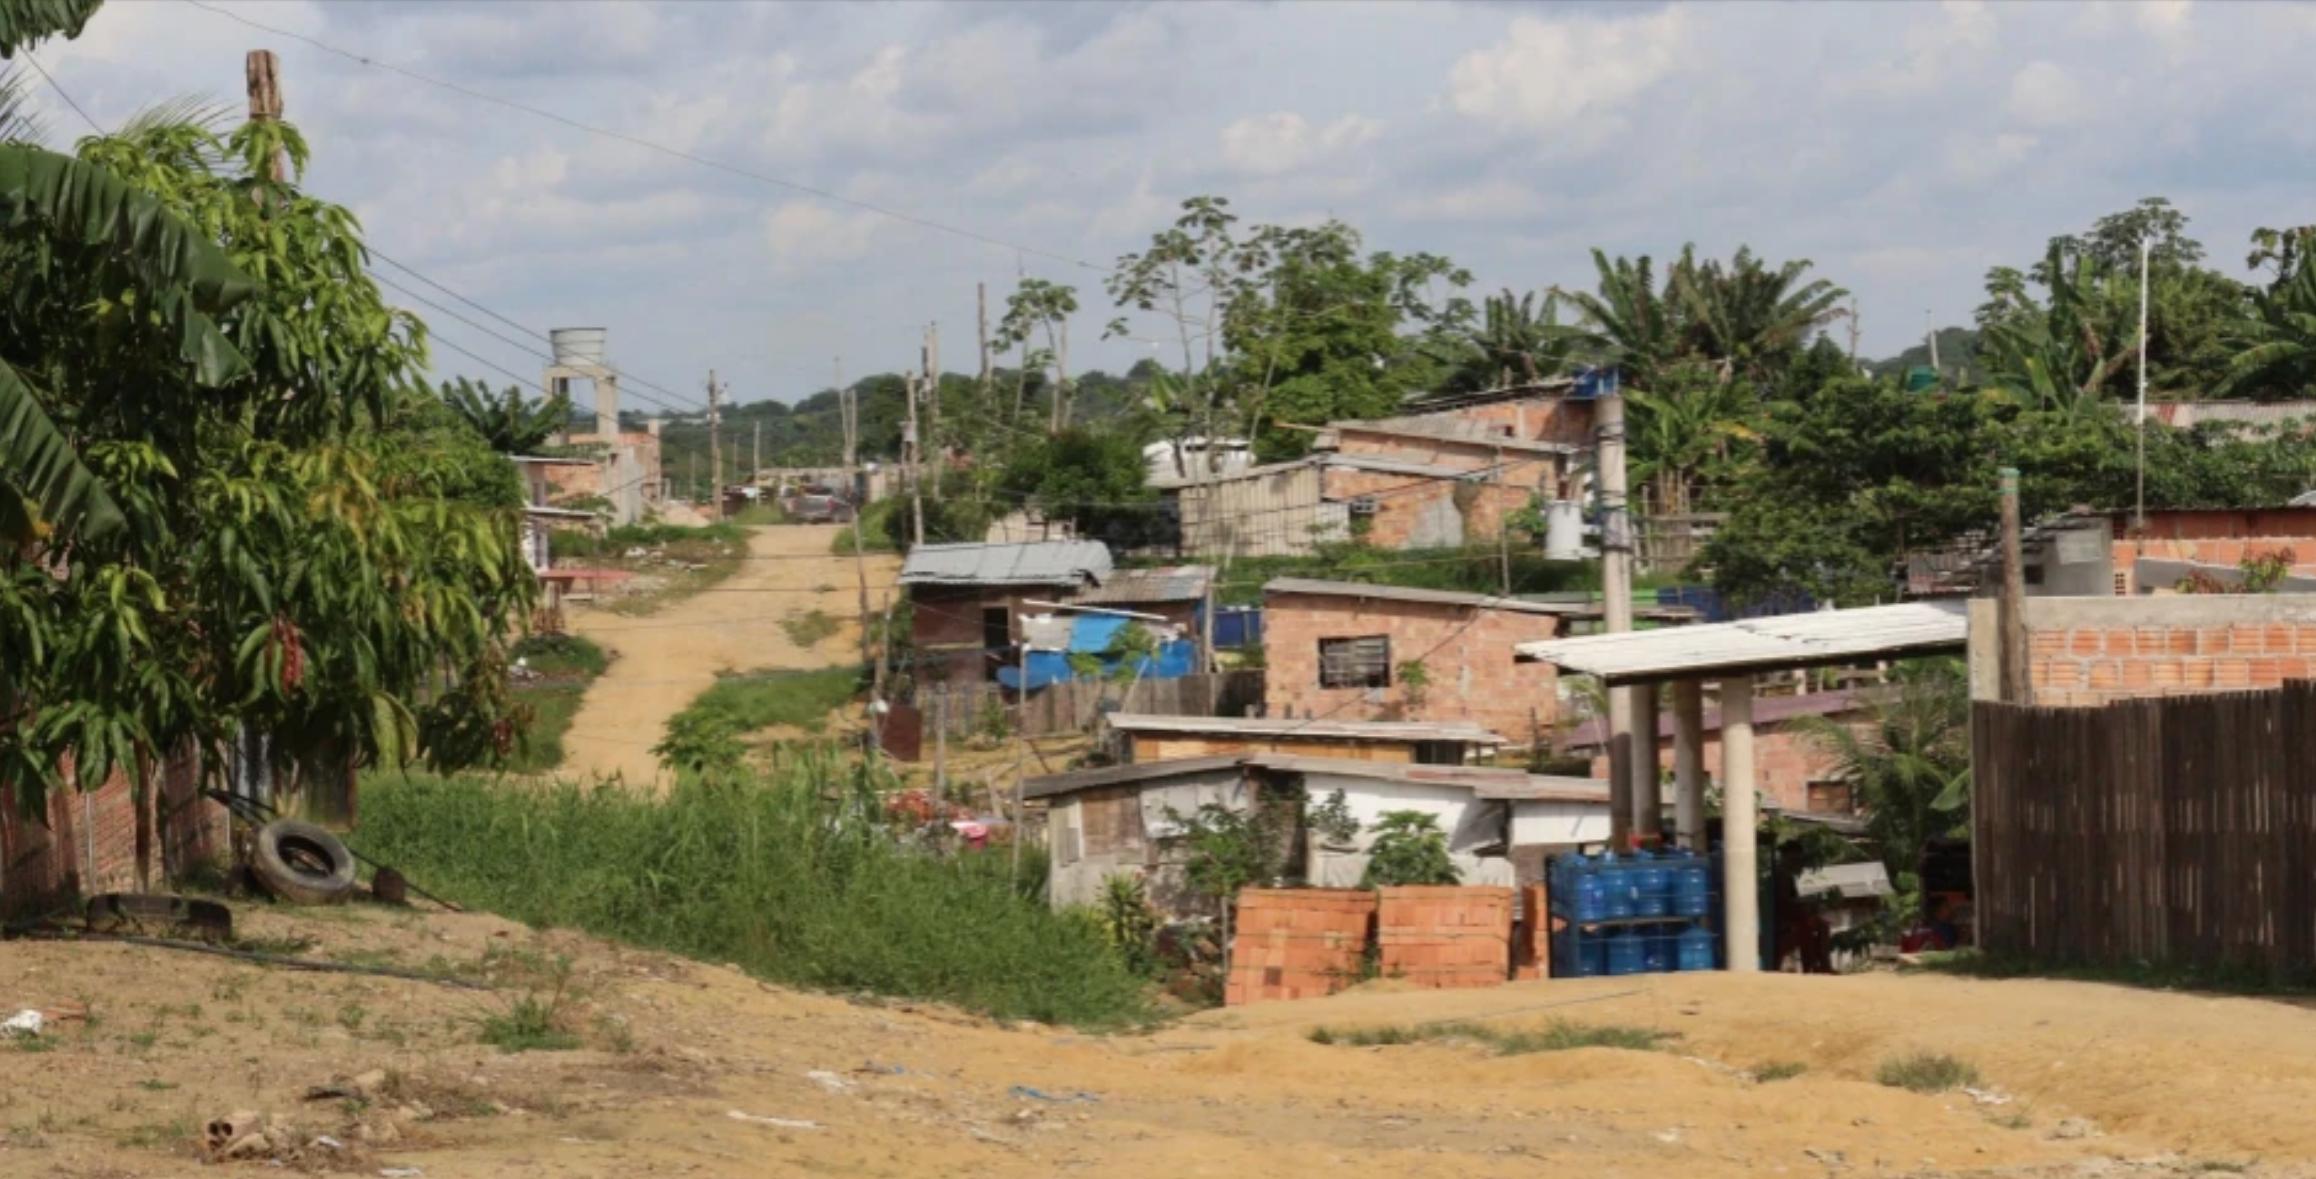 Parque das Tribos neighborhood, located in the West Zone of Manaus. (Photo: Jullie Pereira)